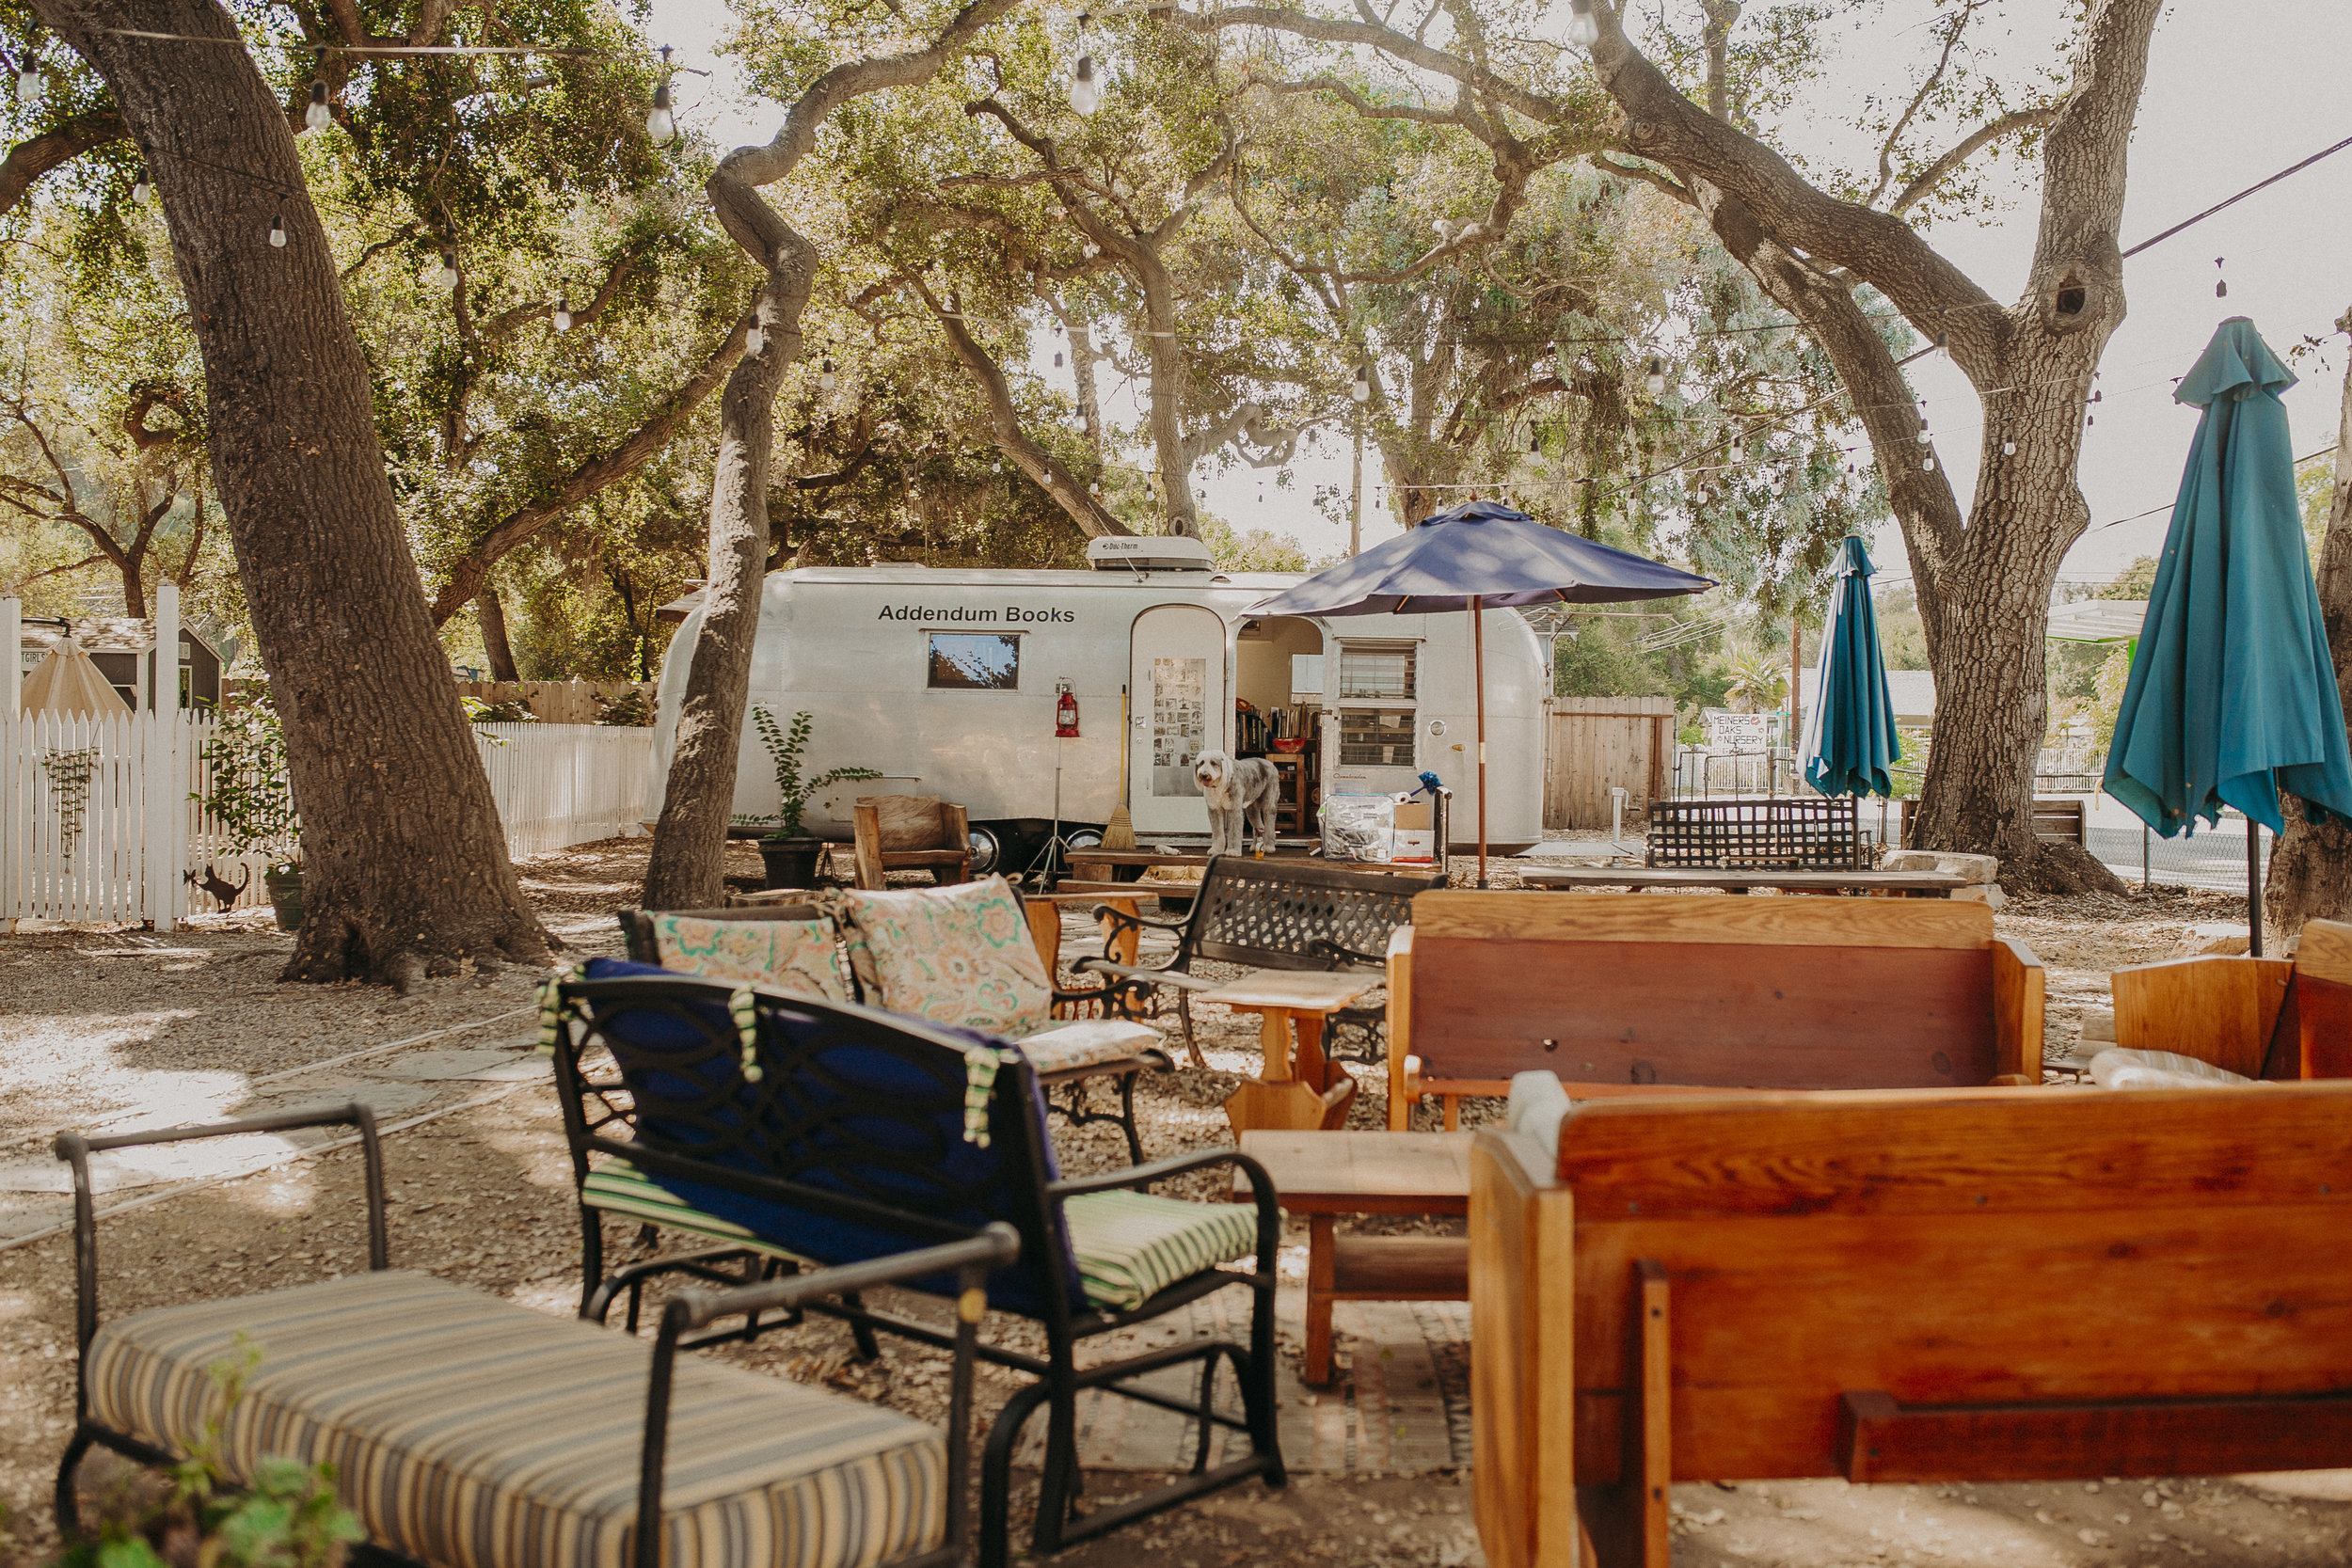 ojai-california-travel-guide-what-to-see-do-eat-17.jpg